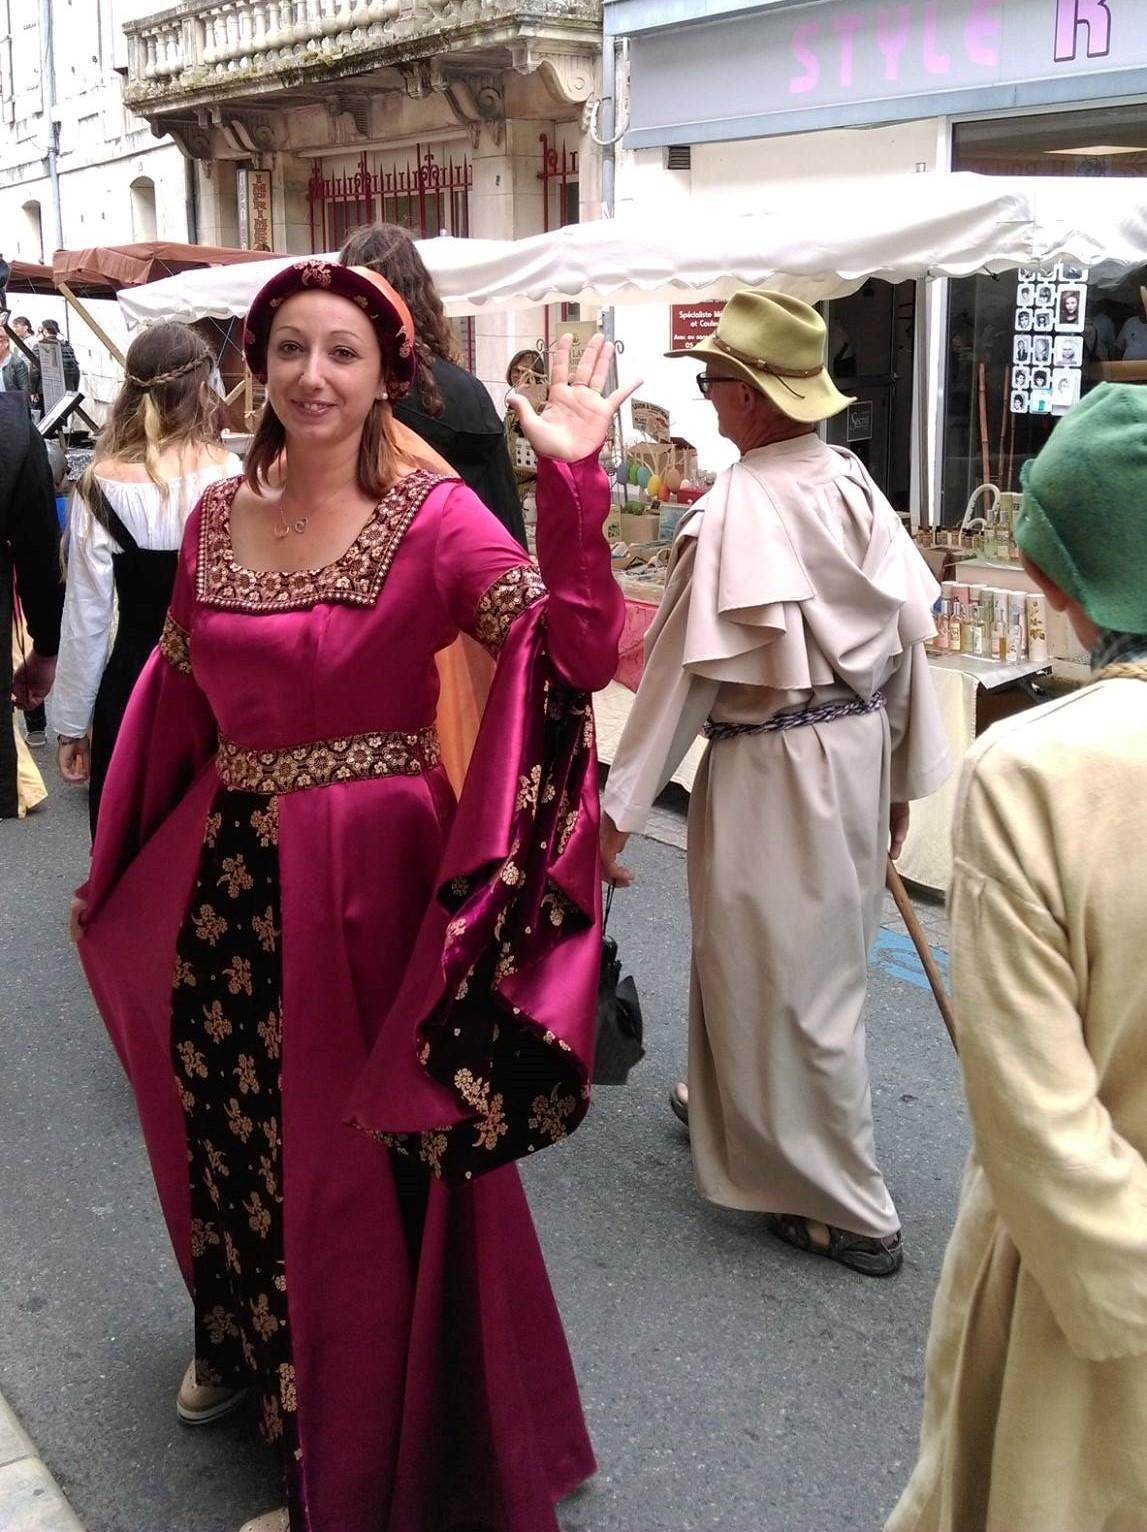 Fête Médiévale Pons 2017 - GICC (4)